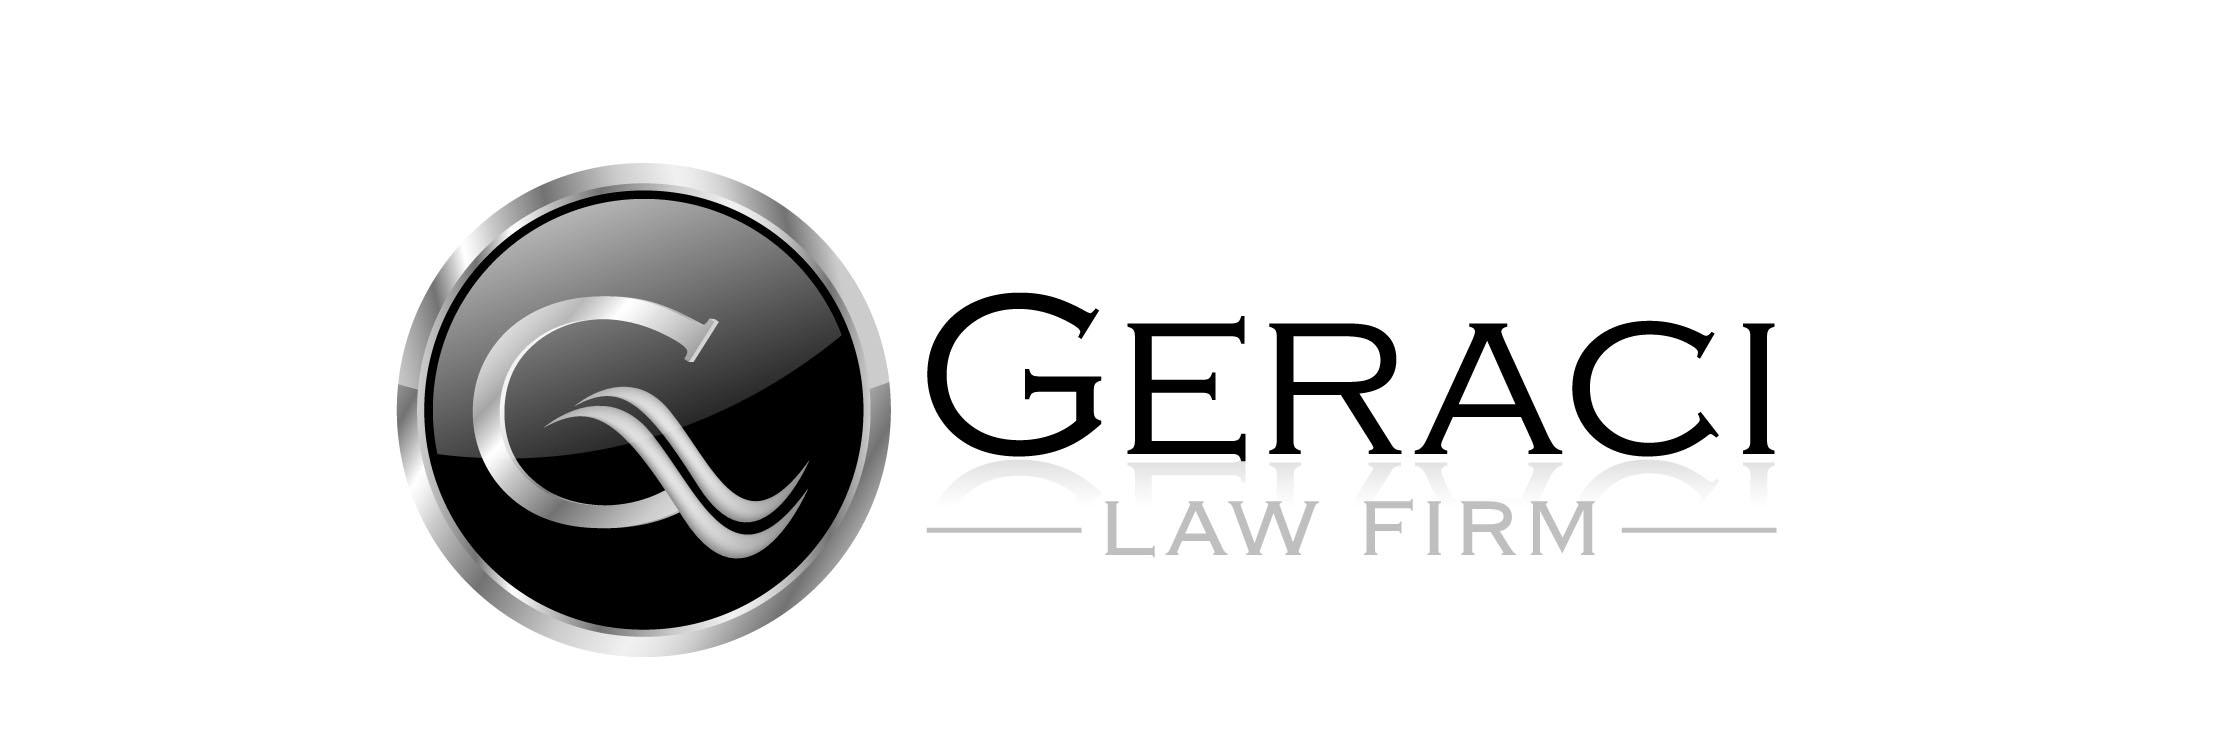 Geraci Law Firm